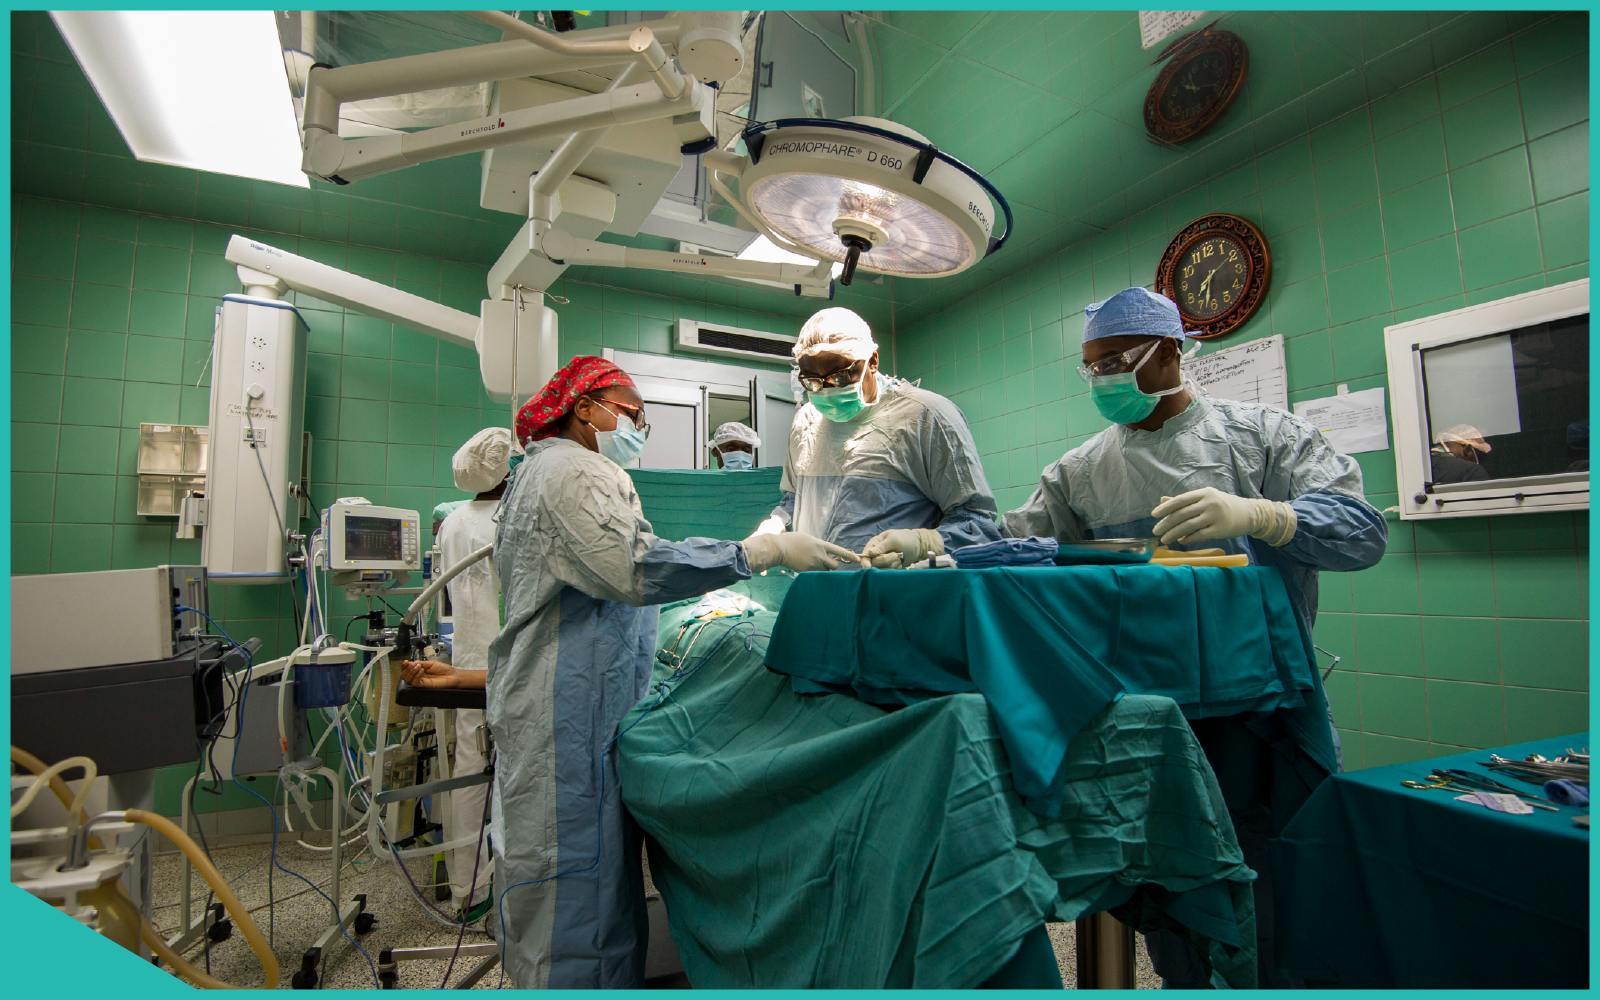 Smart Surgeons